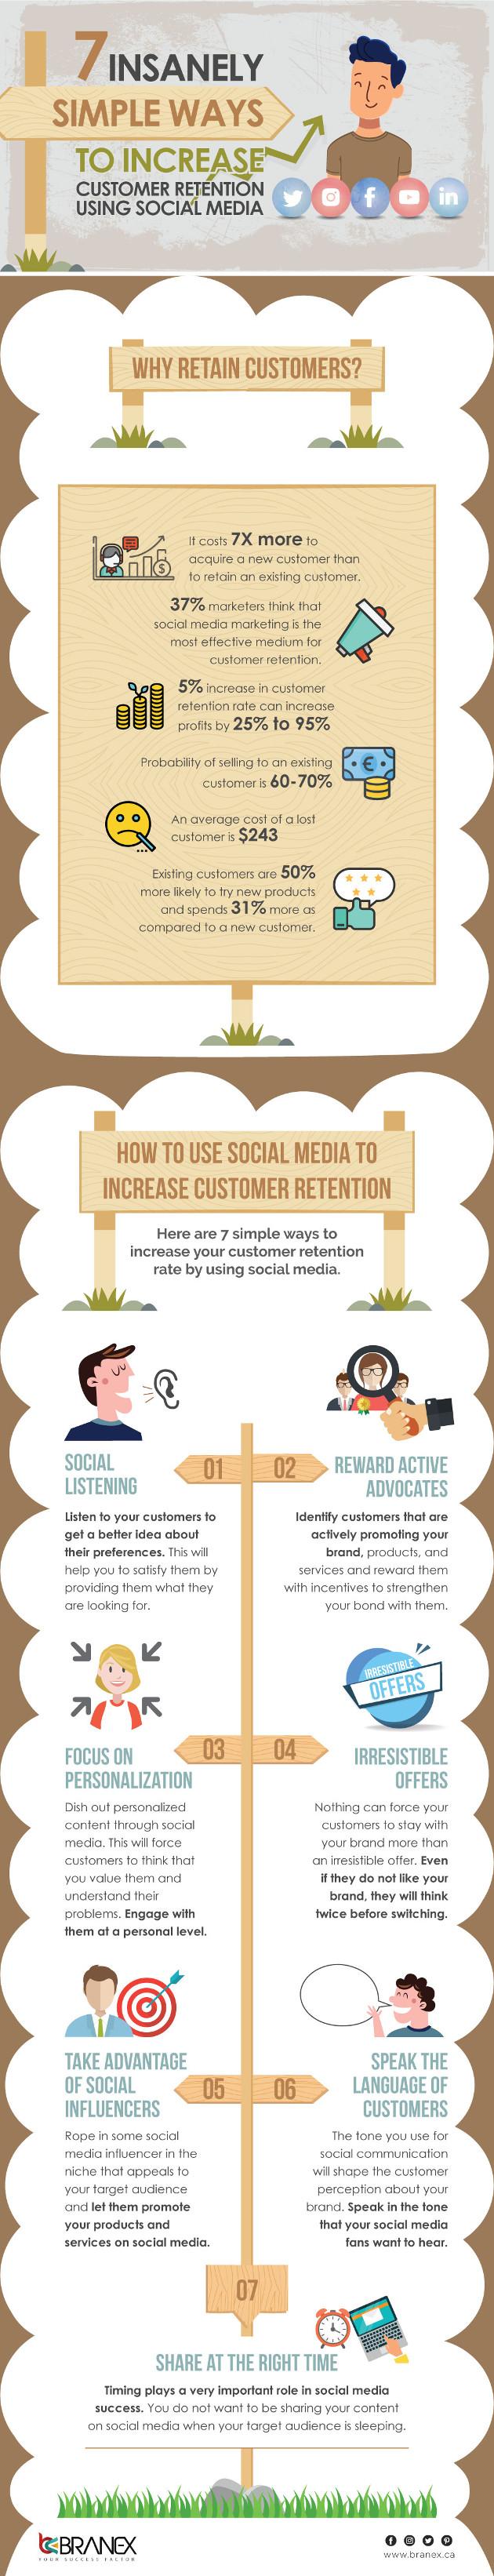 Infographic: Customer Retention Using Social Media